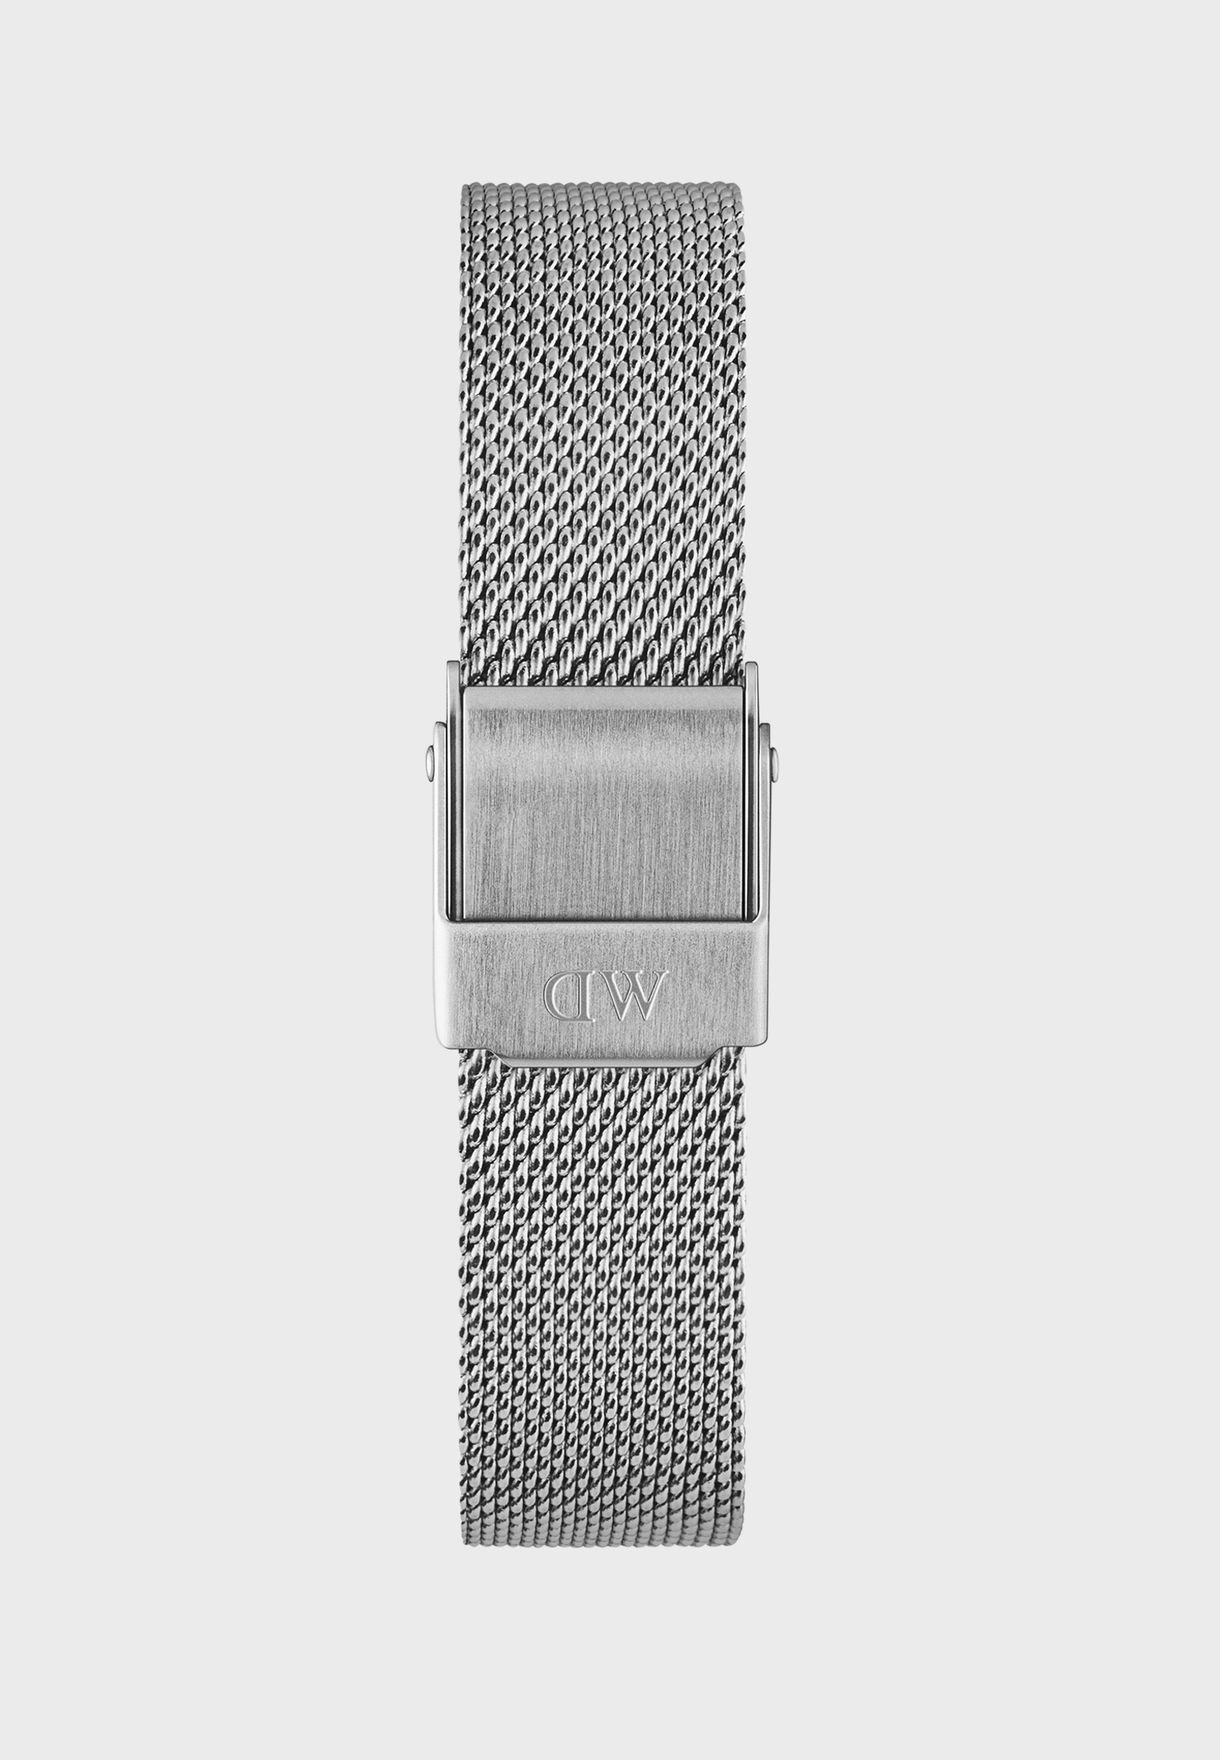 89c9a191c تسوق طقم (ساعة ستيرلينج + سوار) ماركة دانيال ولينغتون لون فضي ...